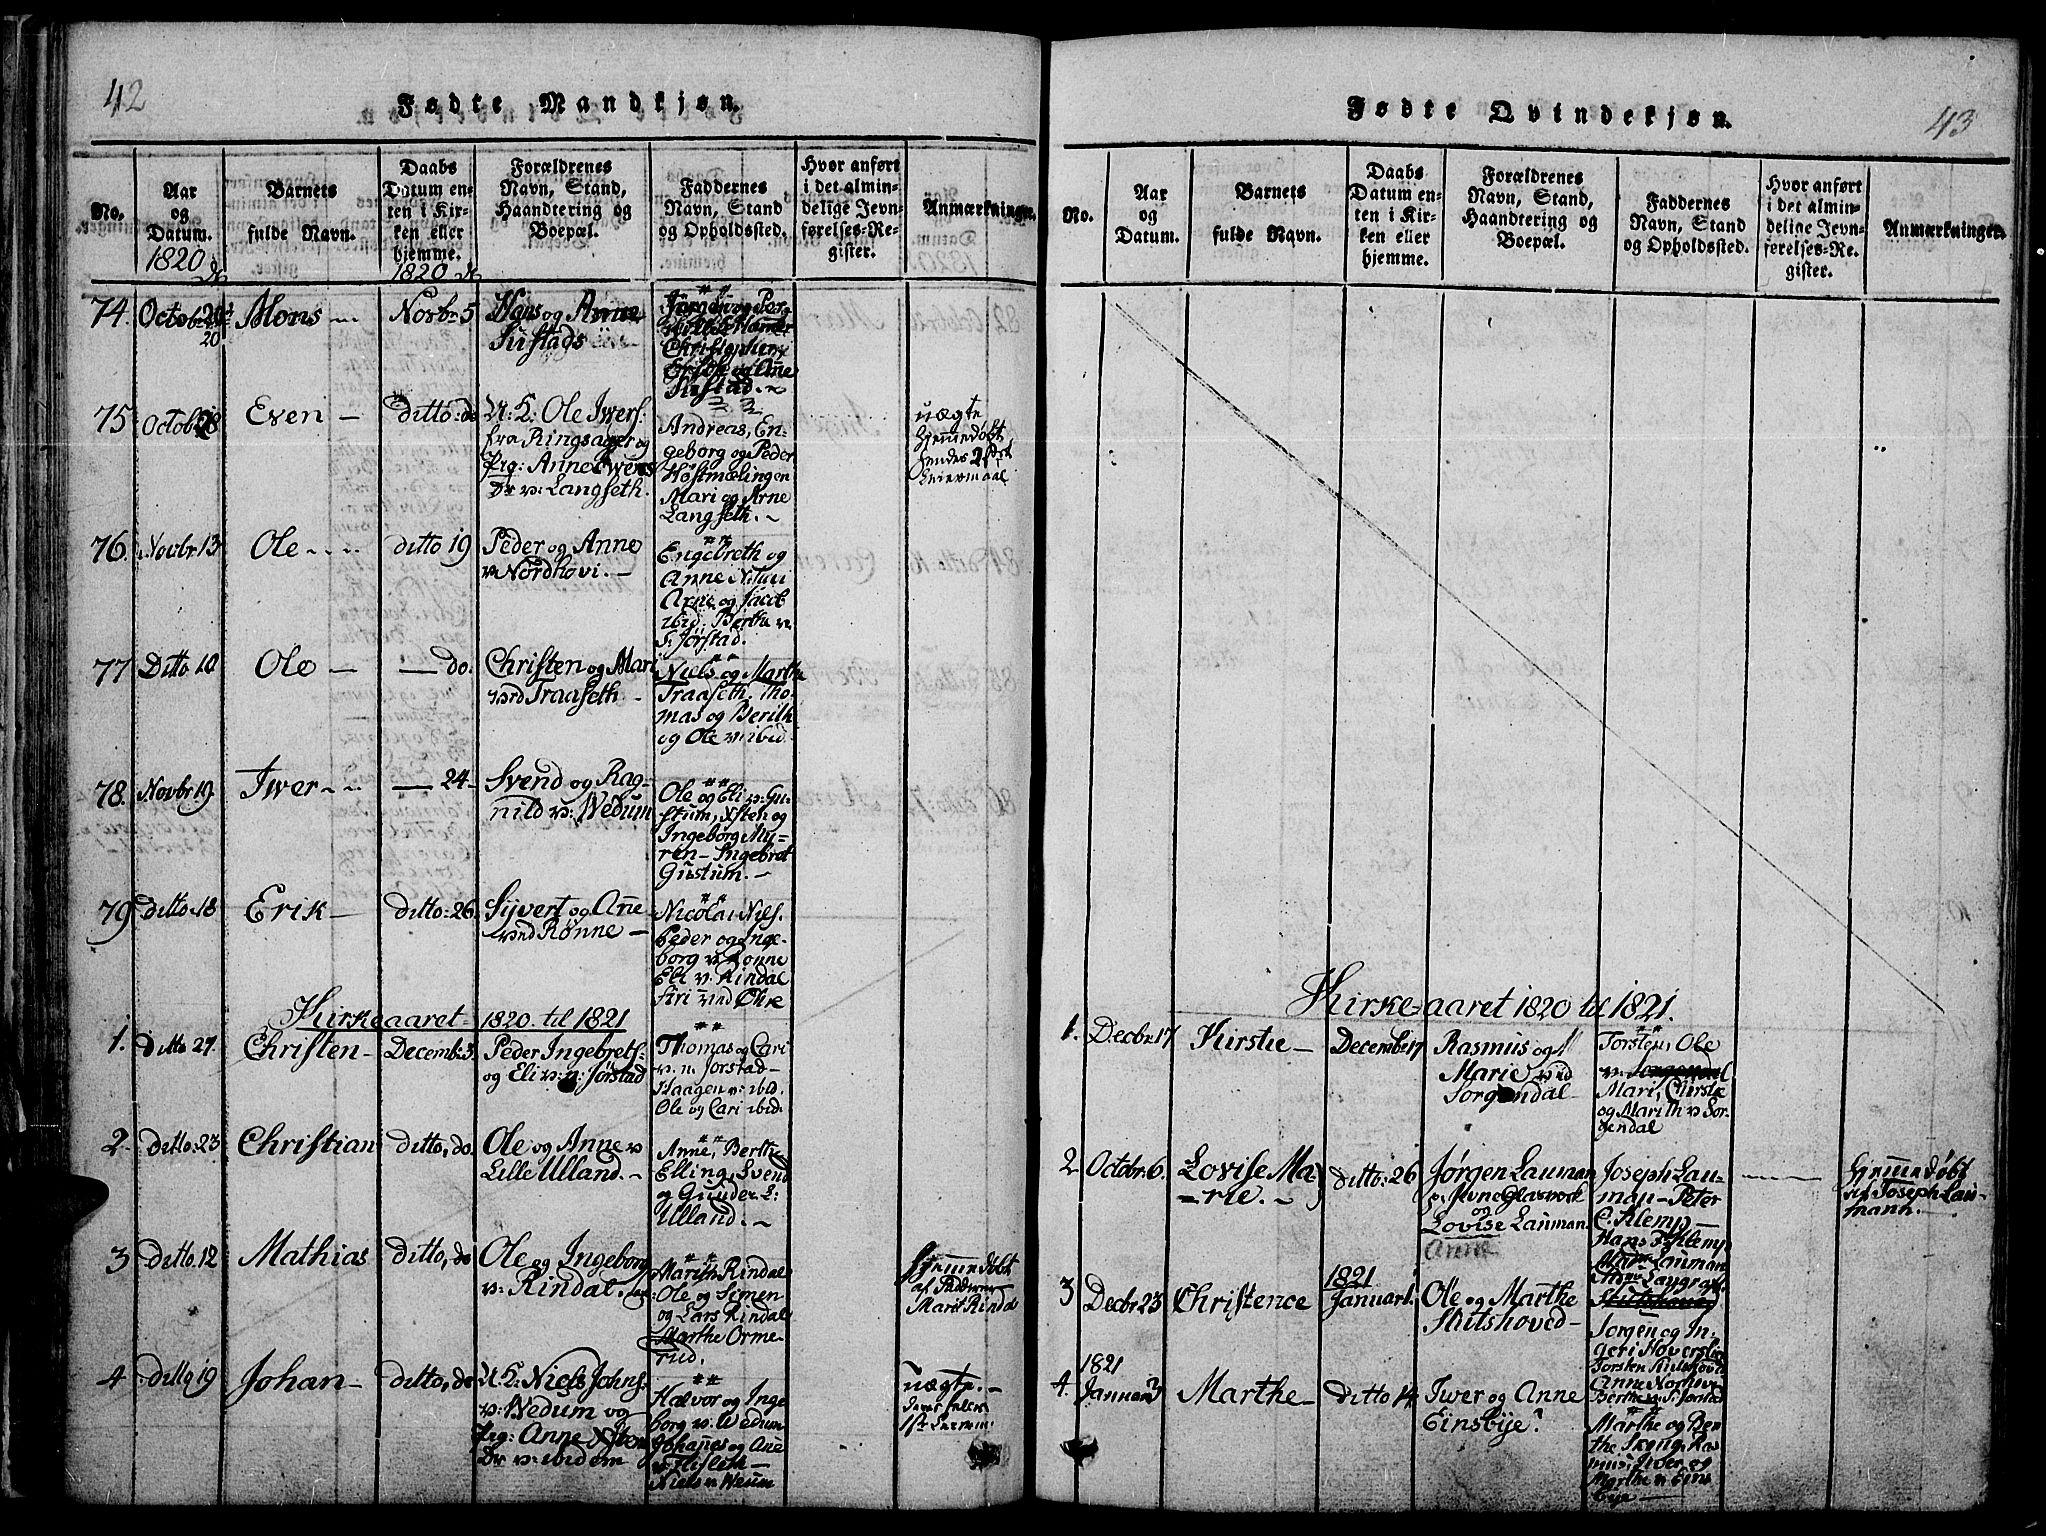 SAH, Fåberg prestekontor, Ministerialbok nr. 3, 1818-1833, s. 42-43